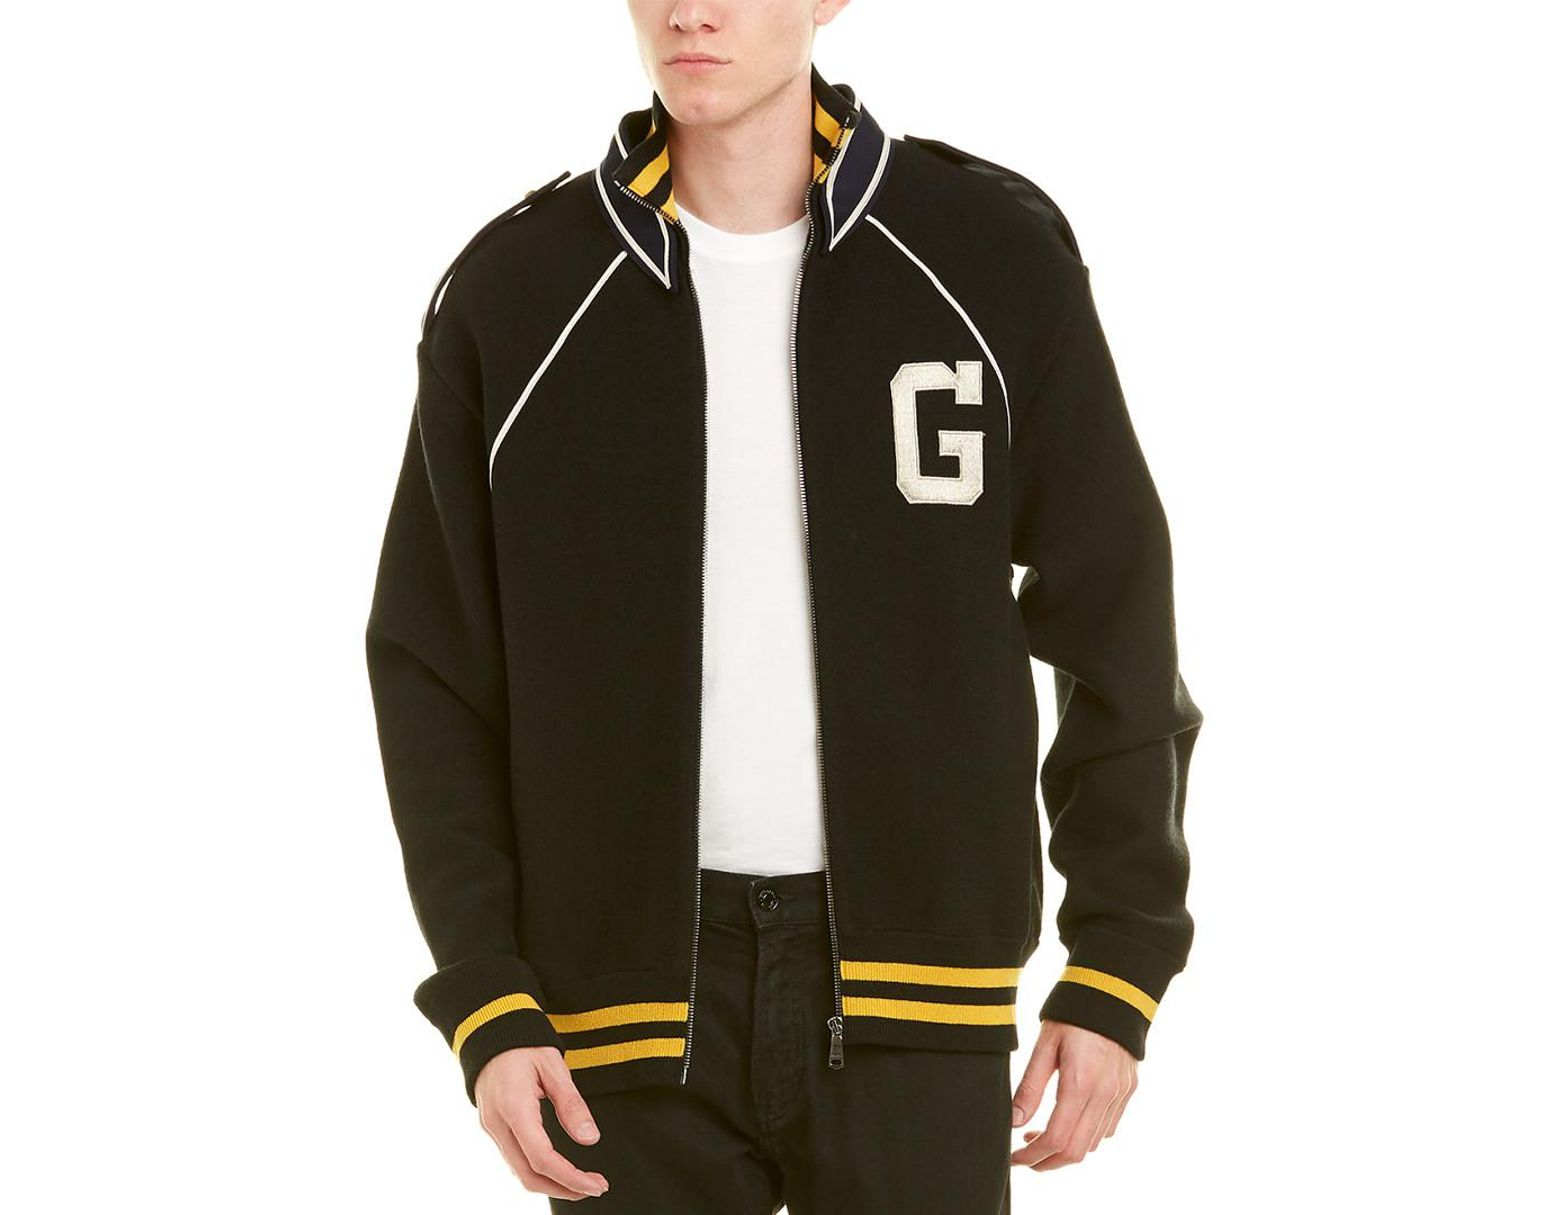 153f2ea3f Gucci G Monogram Wool Varsity Jacket in Black for Men - Save 50% - Lyst